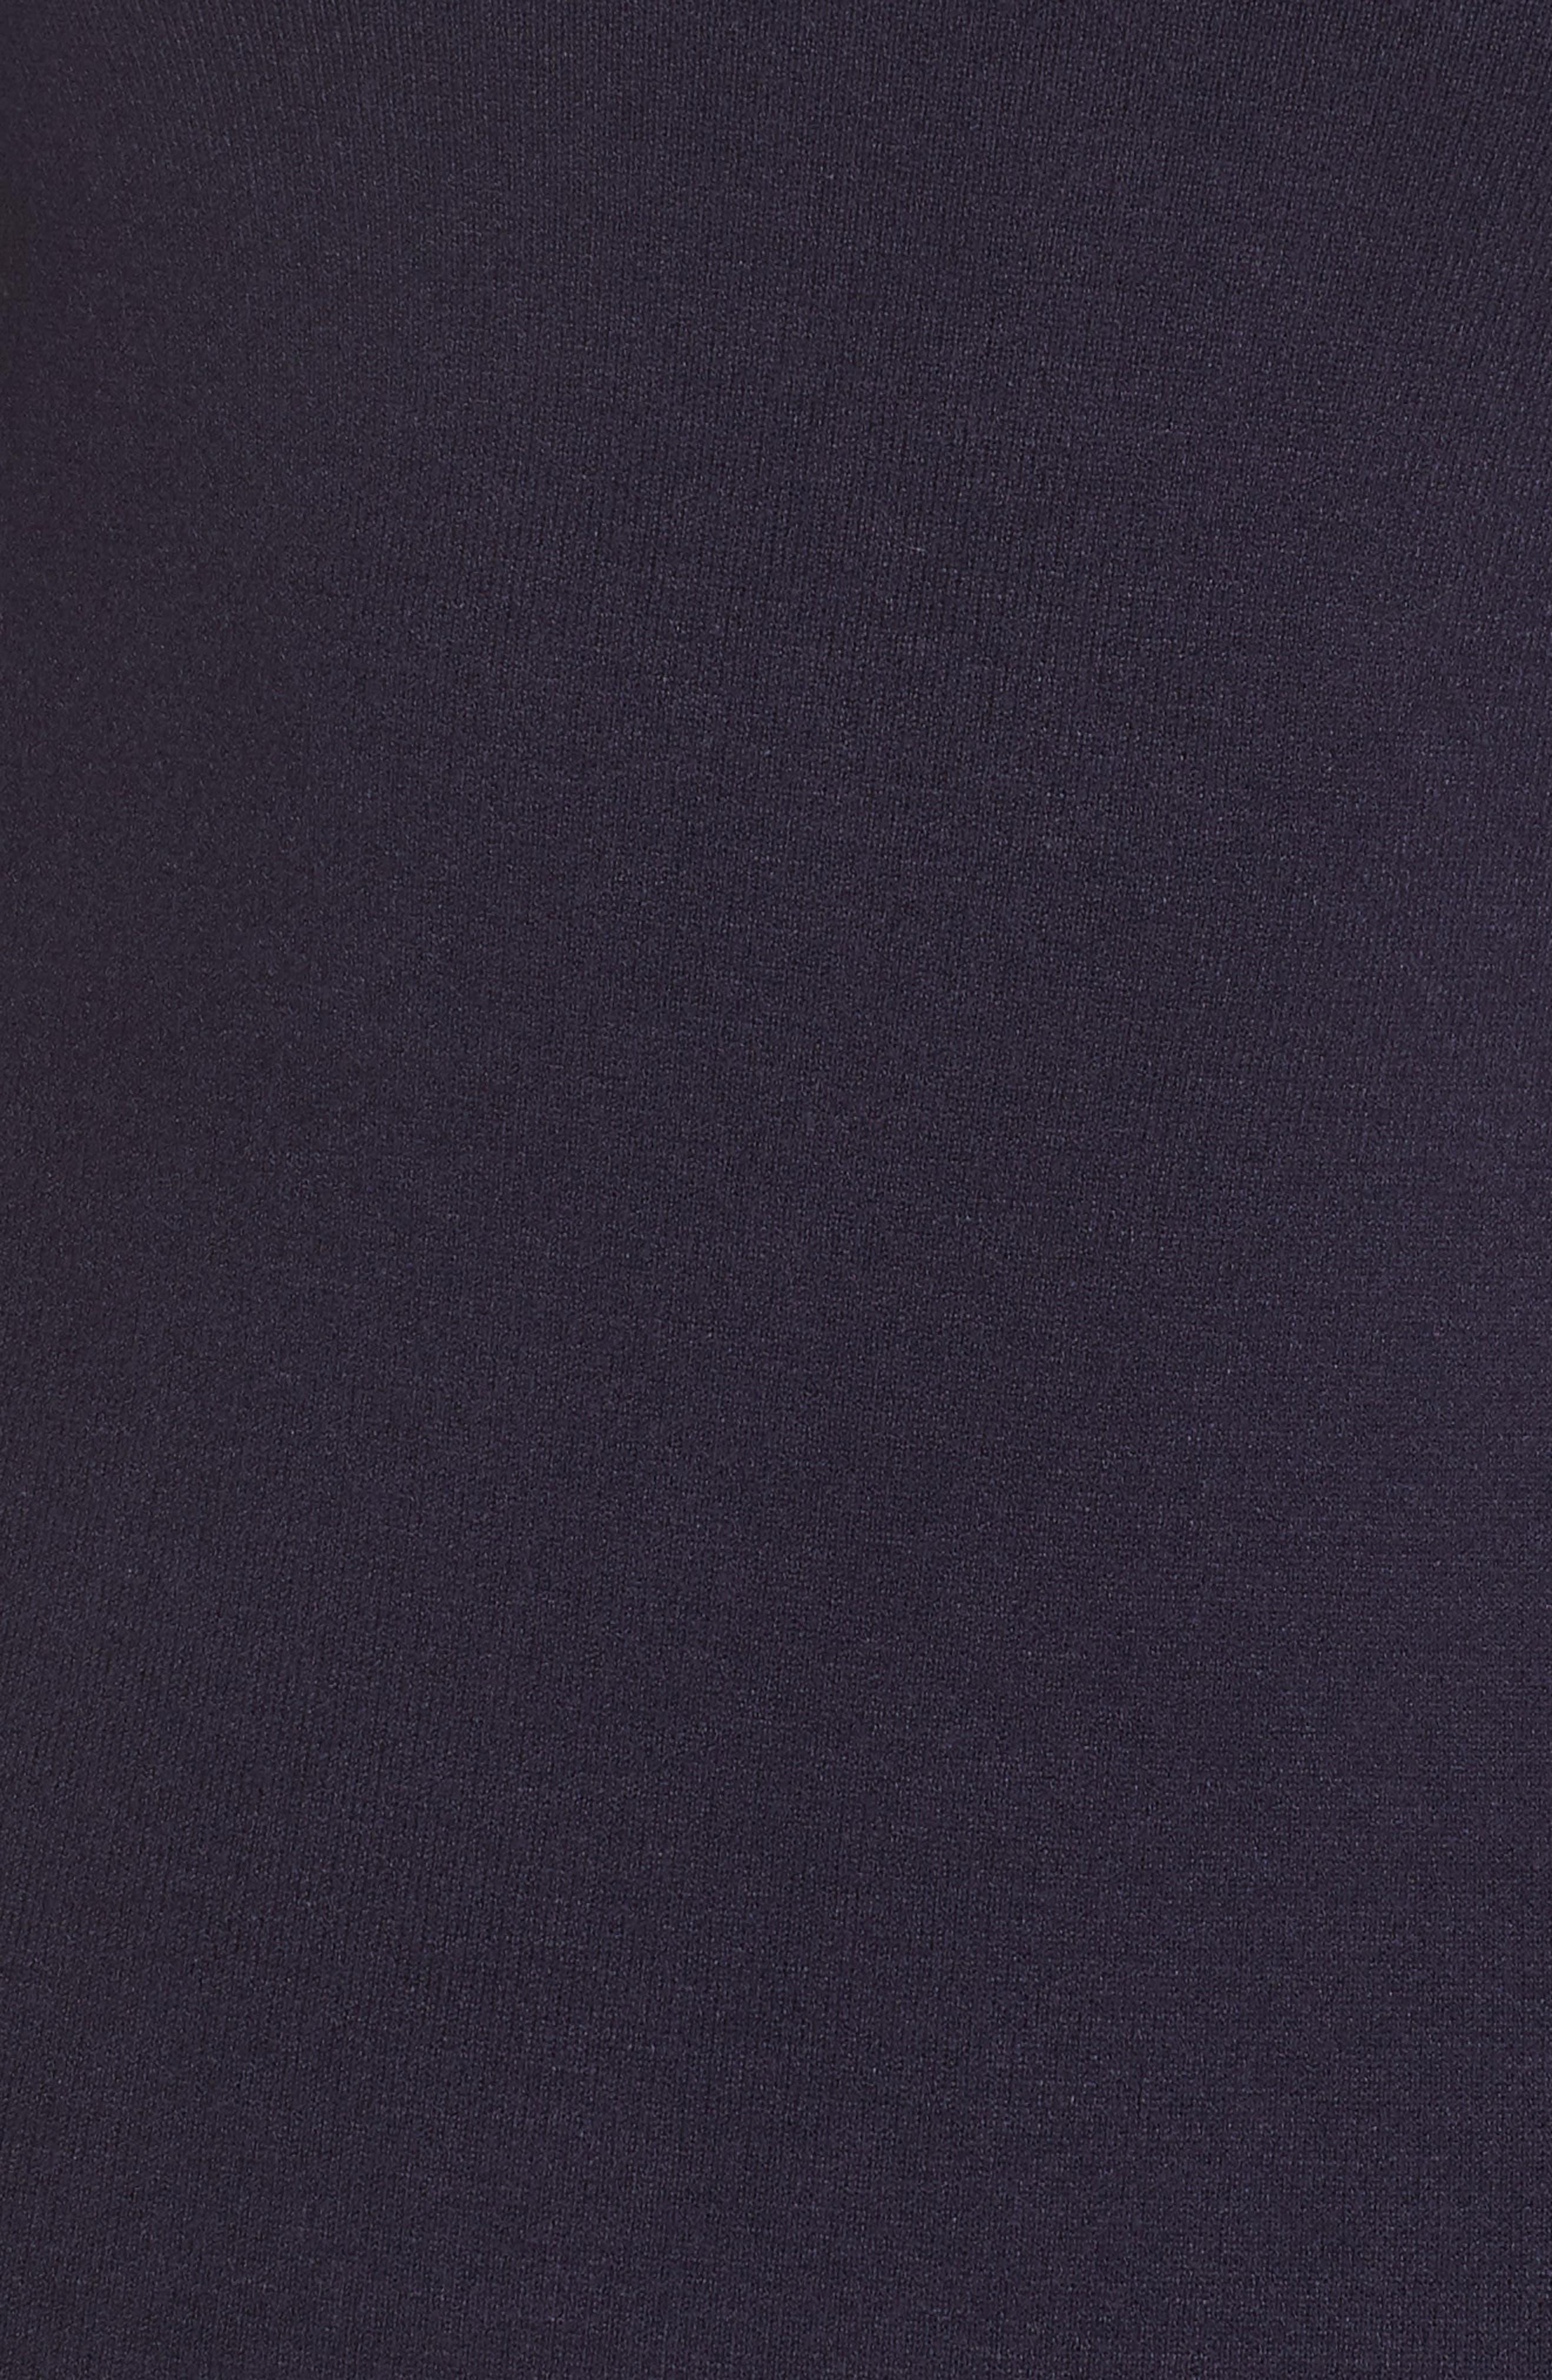 Bell Sleeve Midi Sweater Dress,                             Alternate thumbnail 6, color,                             NAVY